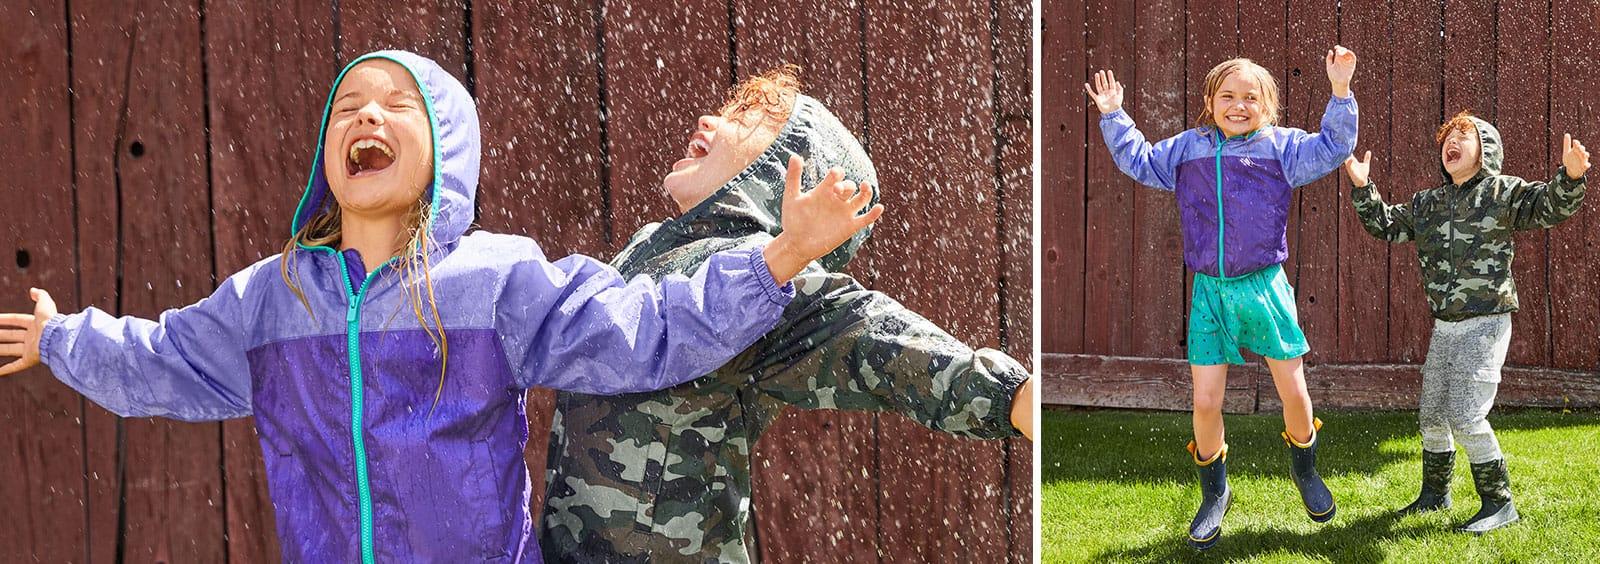 Kids' rain jackets